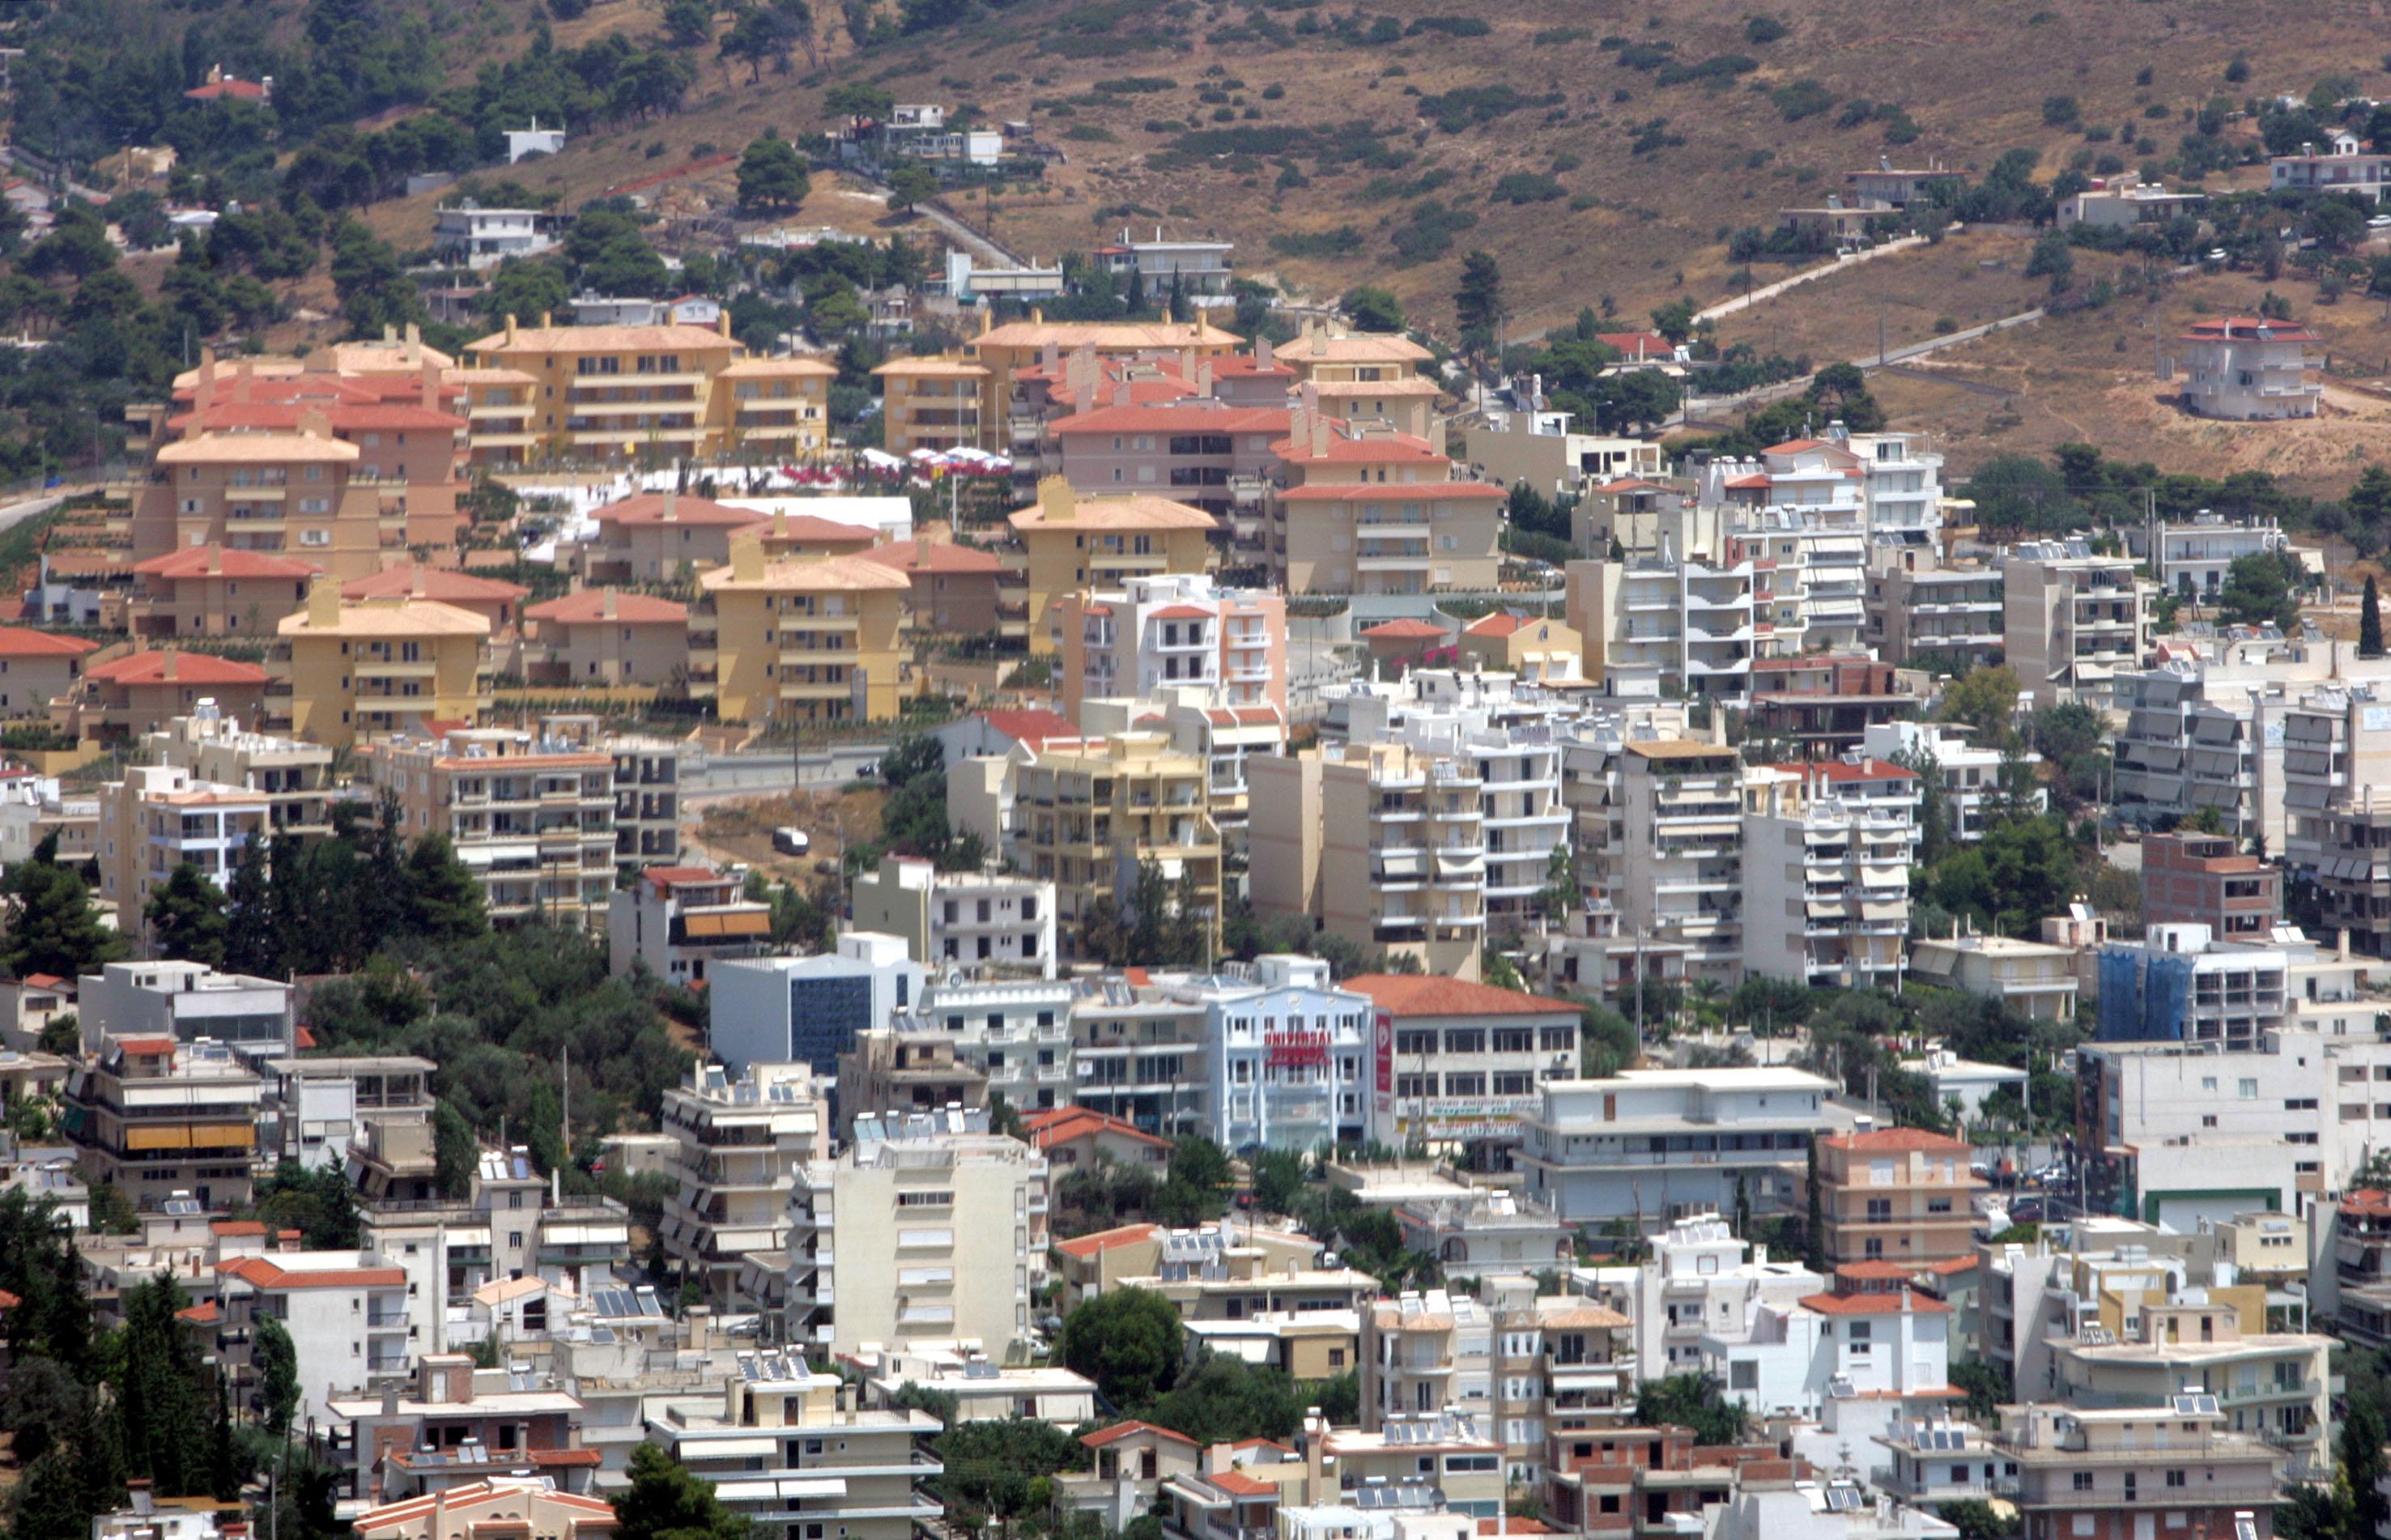 Eurobank Properties: Ζημίες 27,1 εκατ. ευρώ στο πρώτο εξάμηνο | tovima.gr